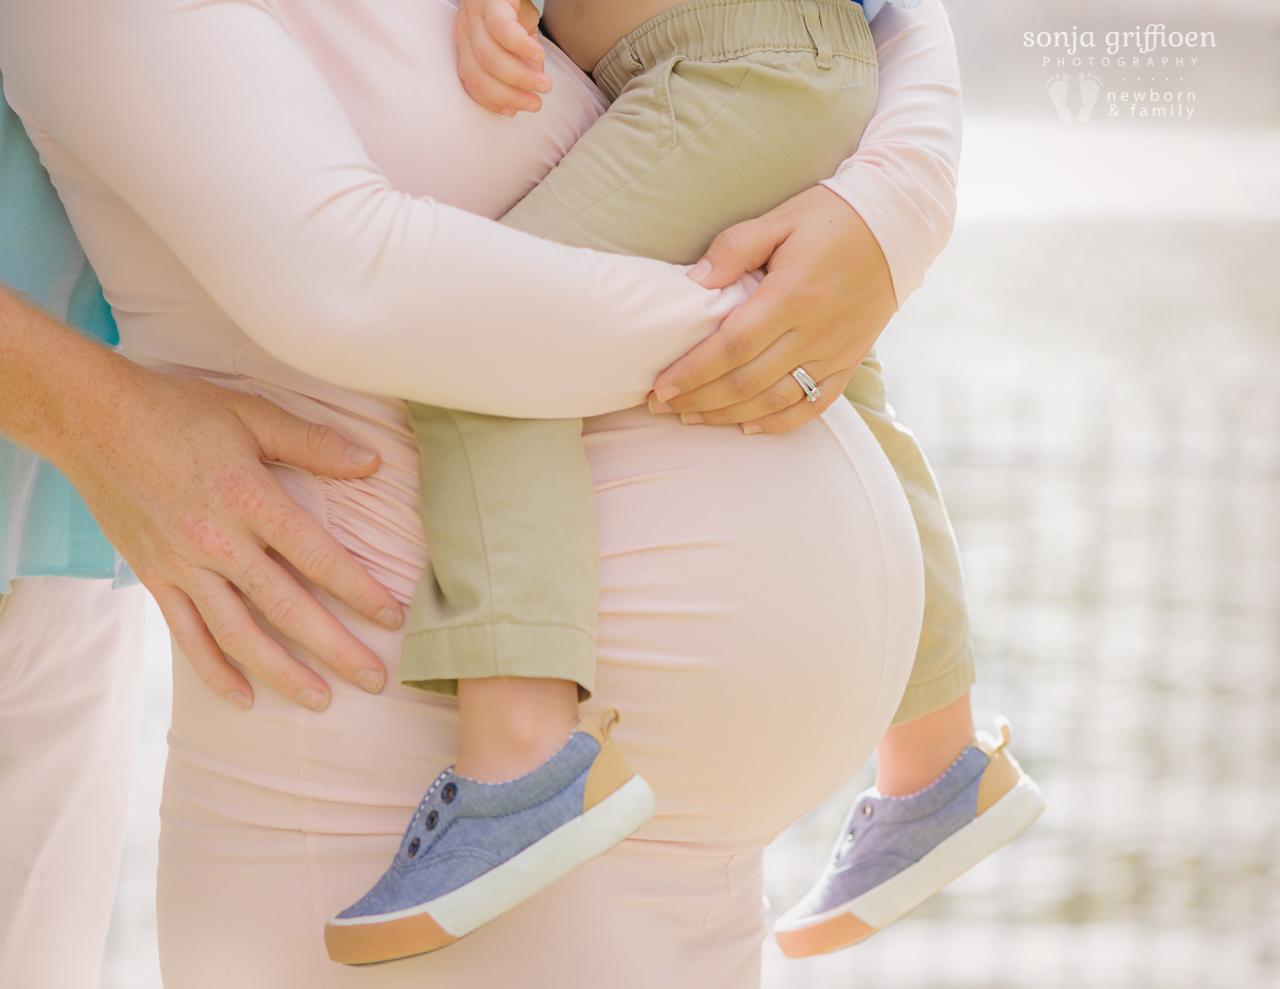 Maria-Maternity-Brisbane-Newborn-Photographer-Sonja-Griffioen-26.jpg